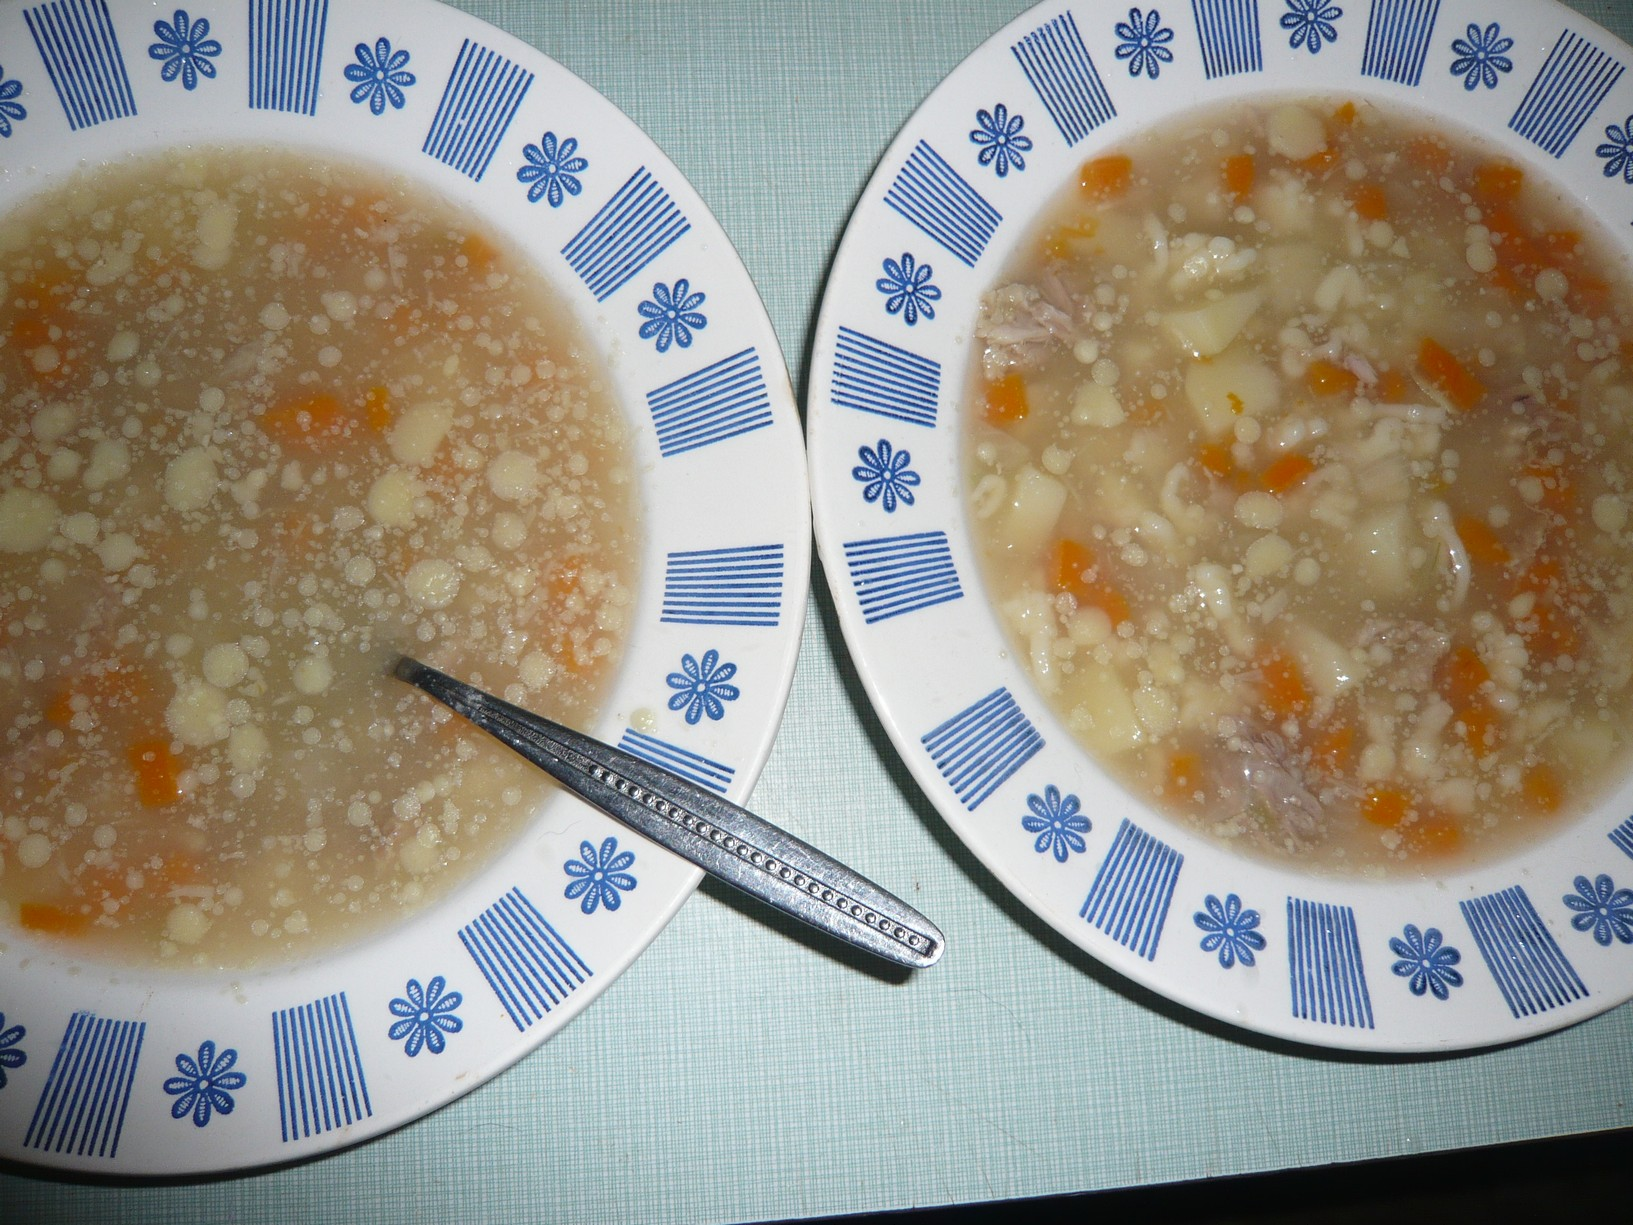 Drůbeží polévka s haluškami z pohanky